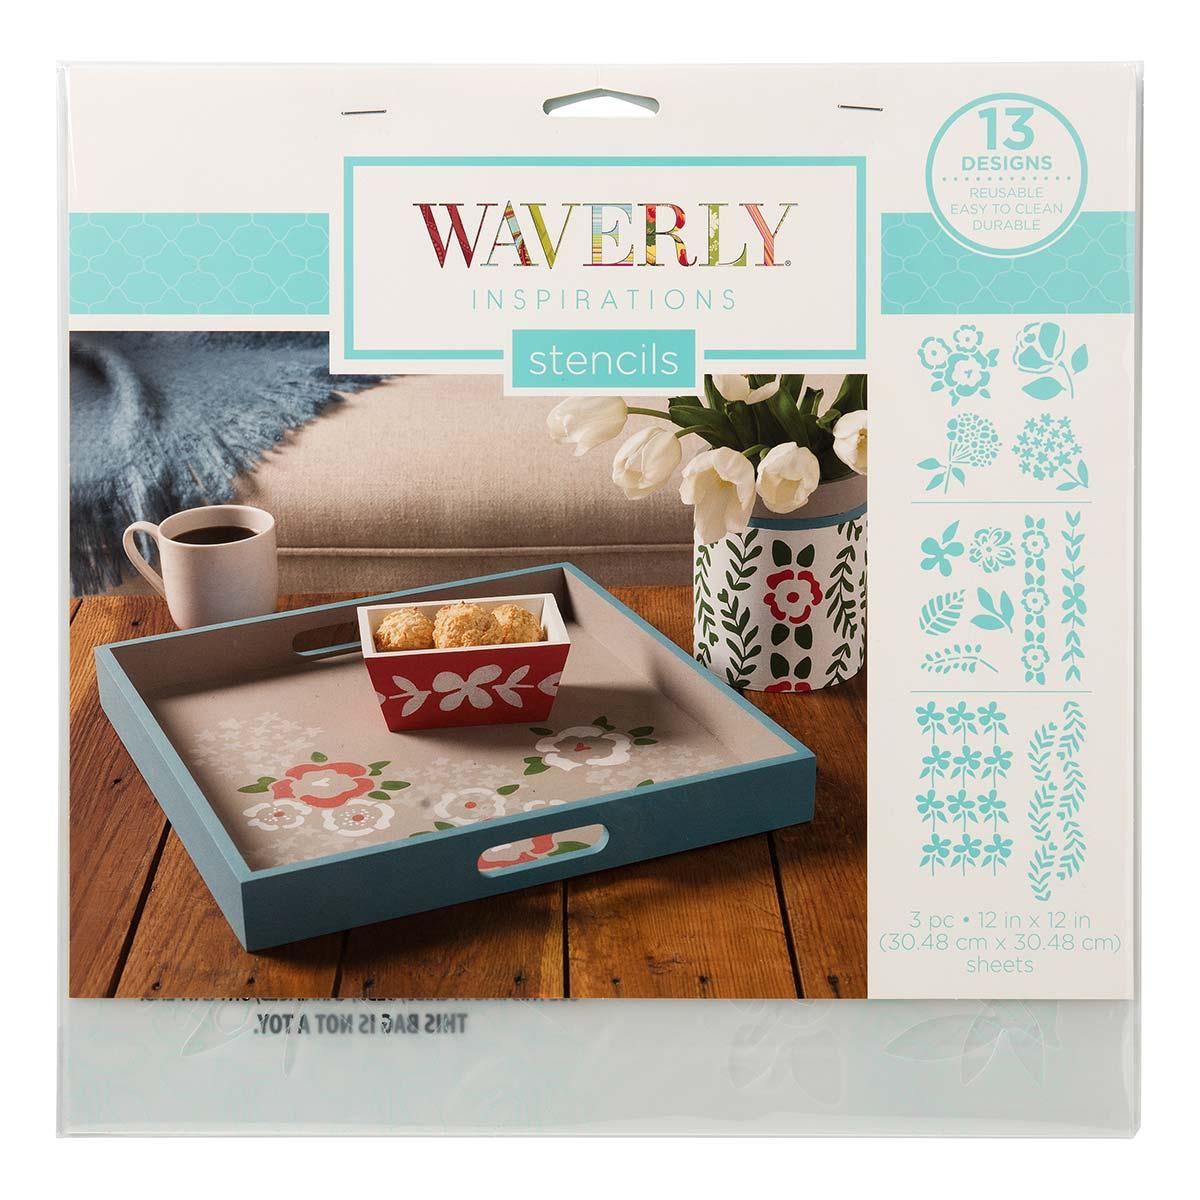 Waverly ® Inspirations Laser Stencils - Décor - Sketch Floral, 12